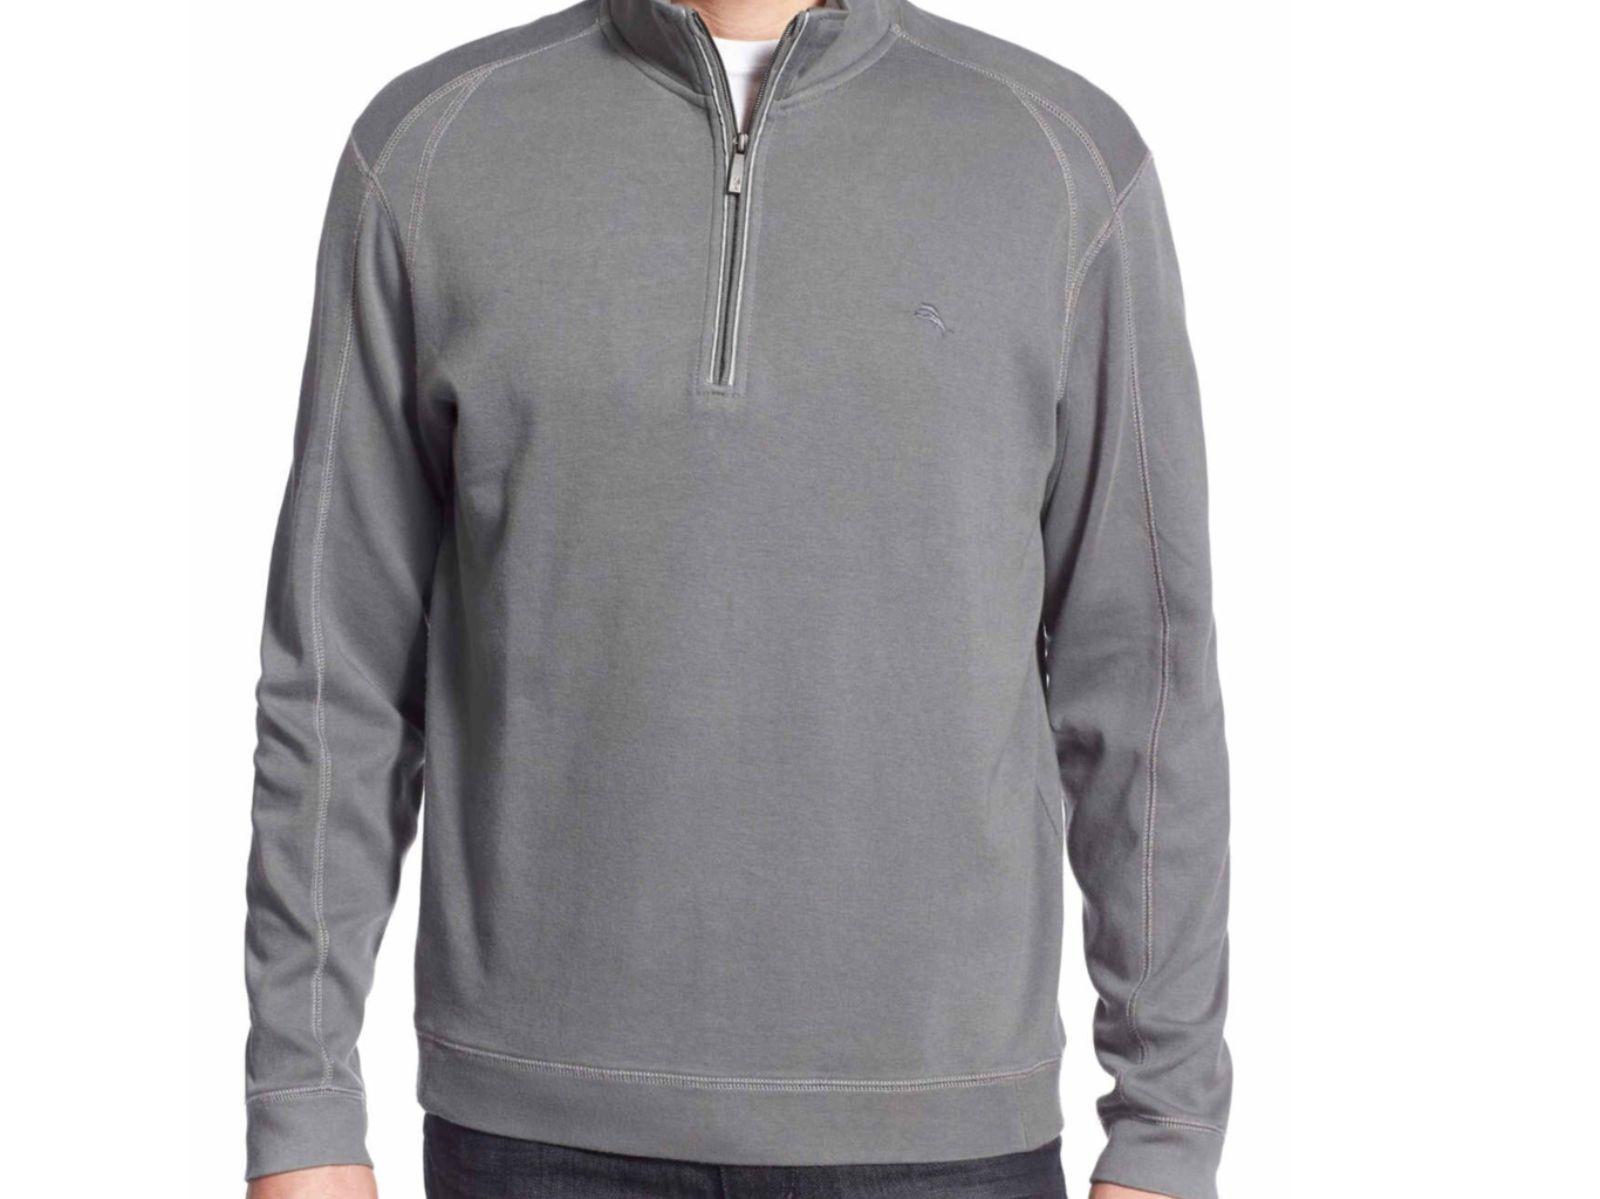 Tommy Bahama Full Time Half Zip Carbon Grau Pullover Sweatshirt Shirt M L XL118